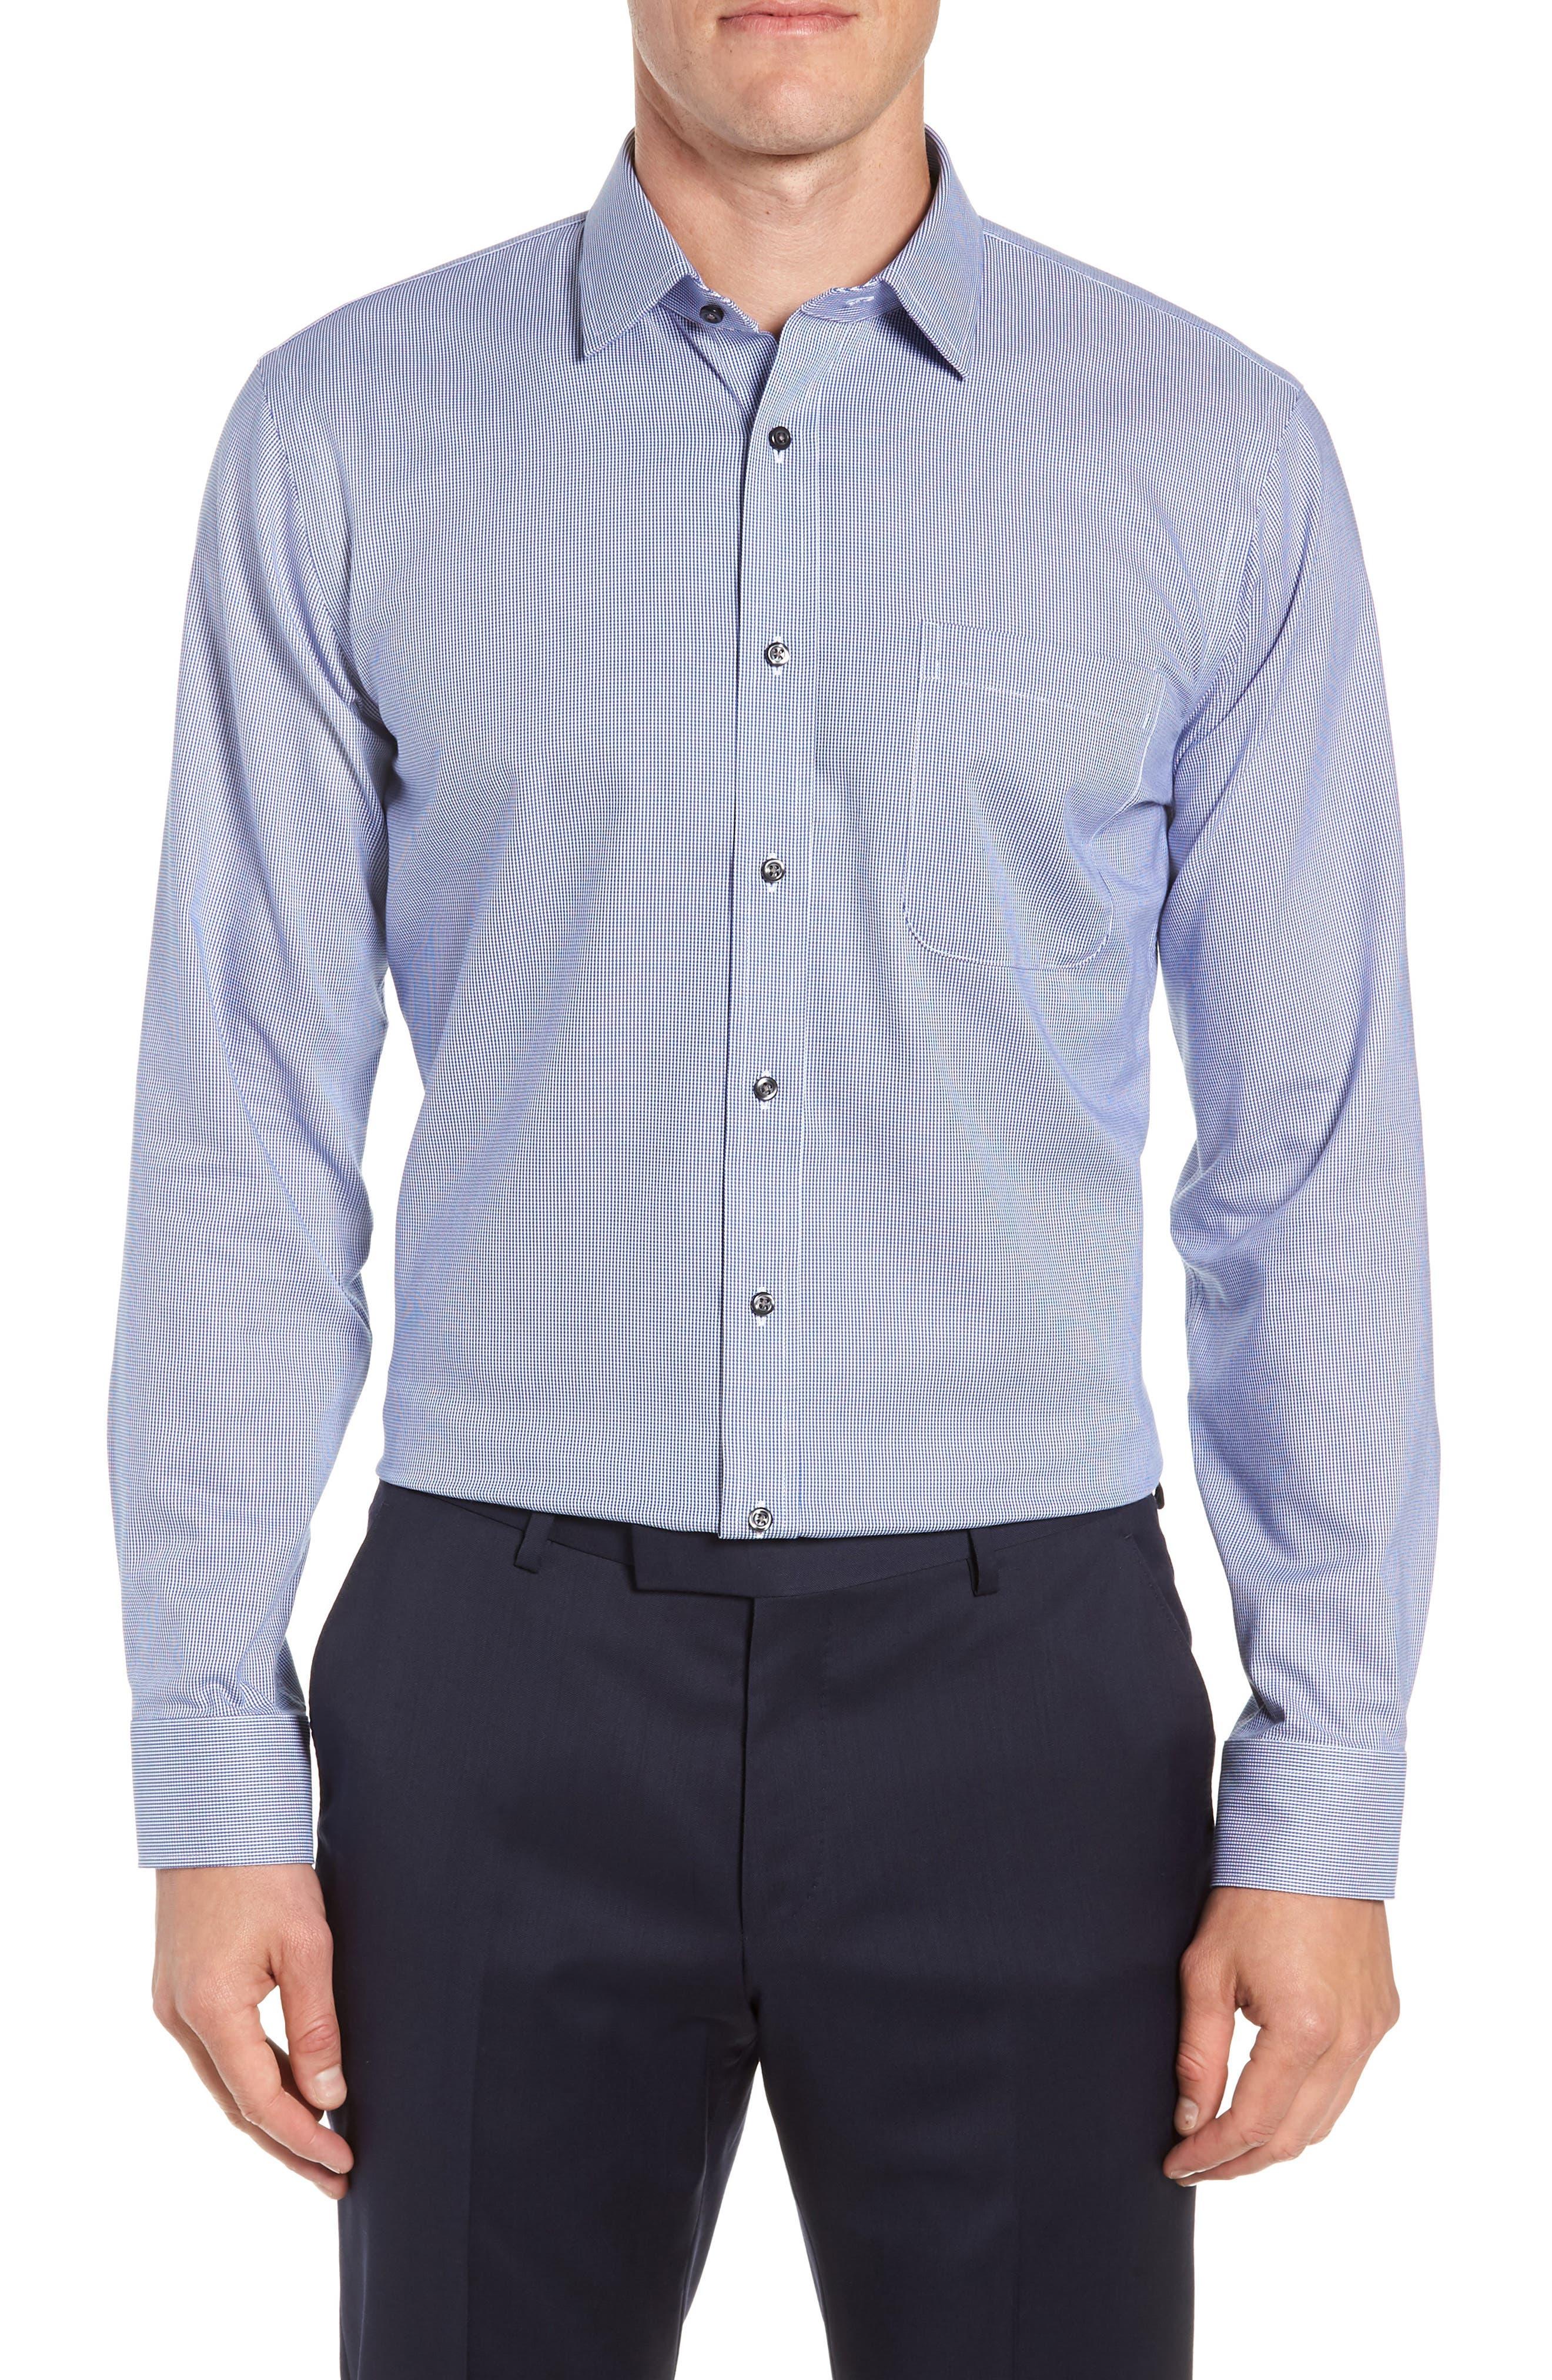 Trim Fit Non-Iron Solid Dress Shirt,                             Main thumbnail 1, color,                             NAVY DRESS